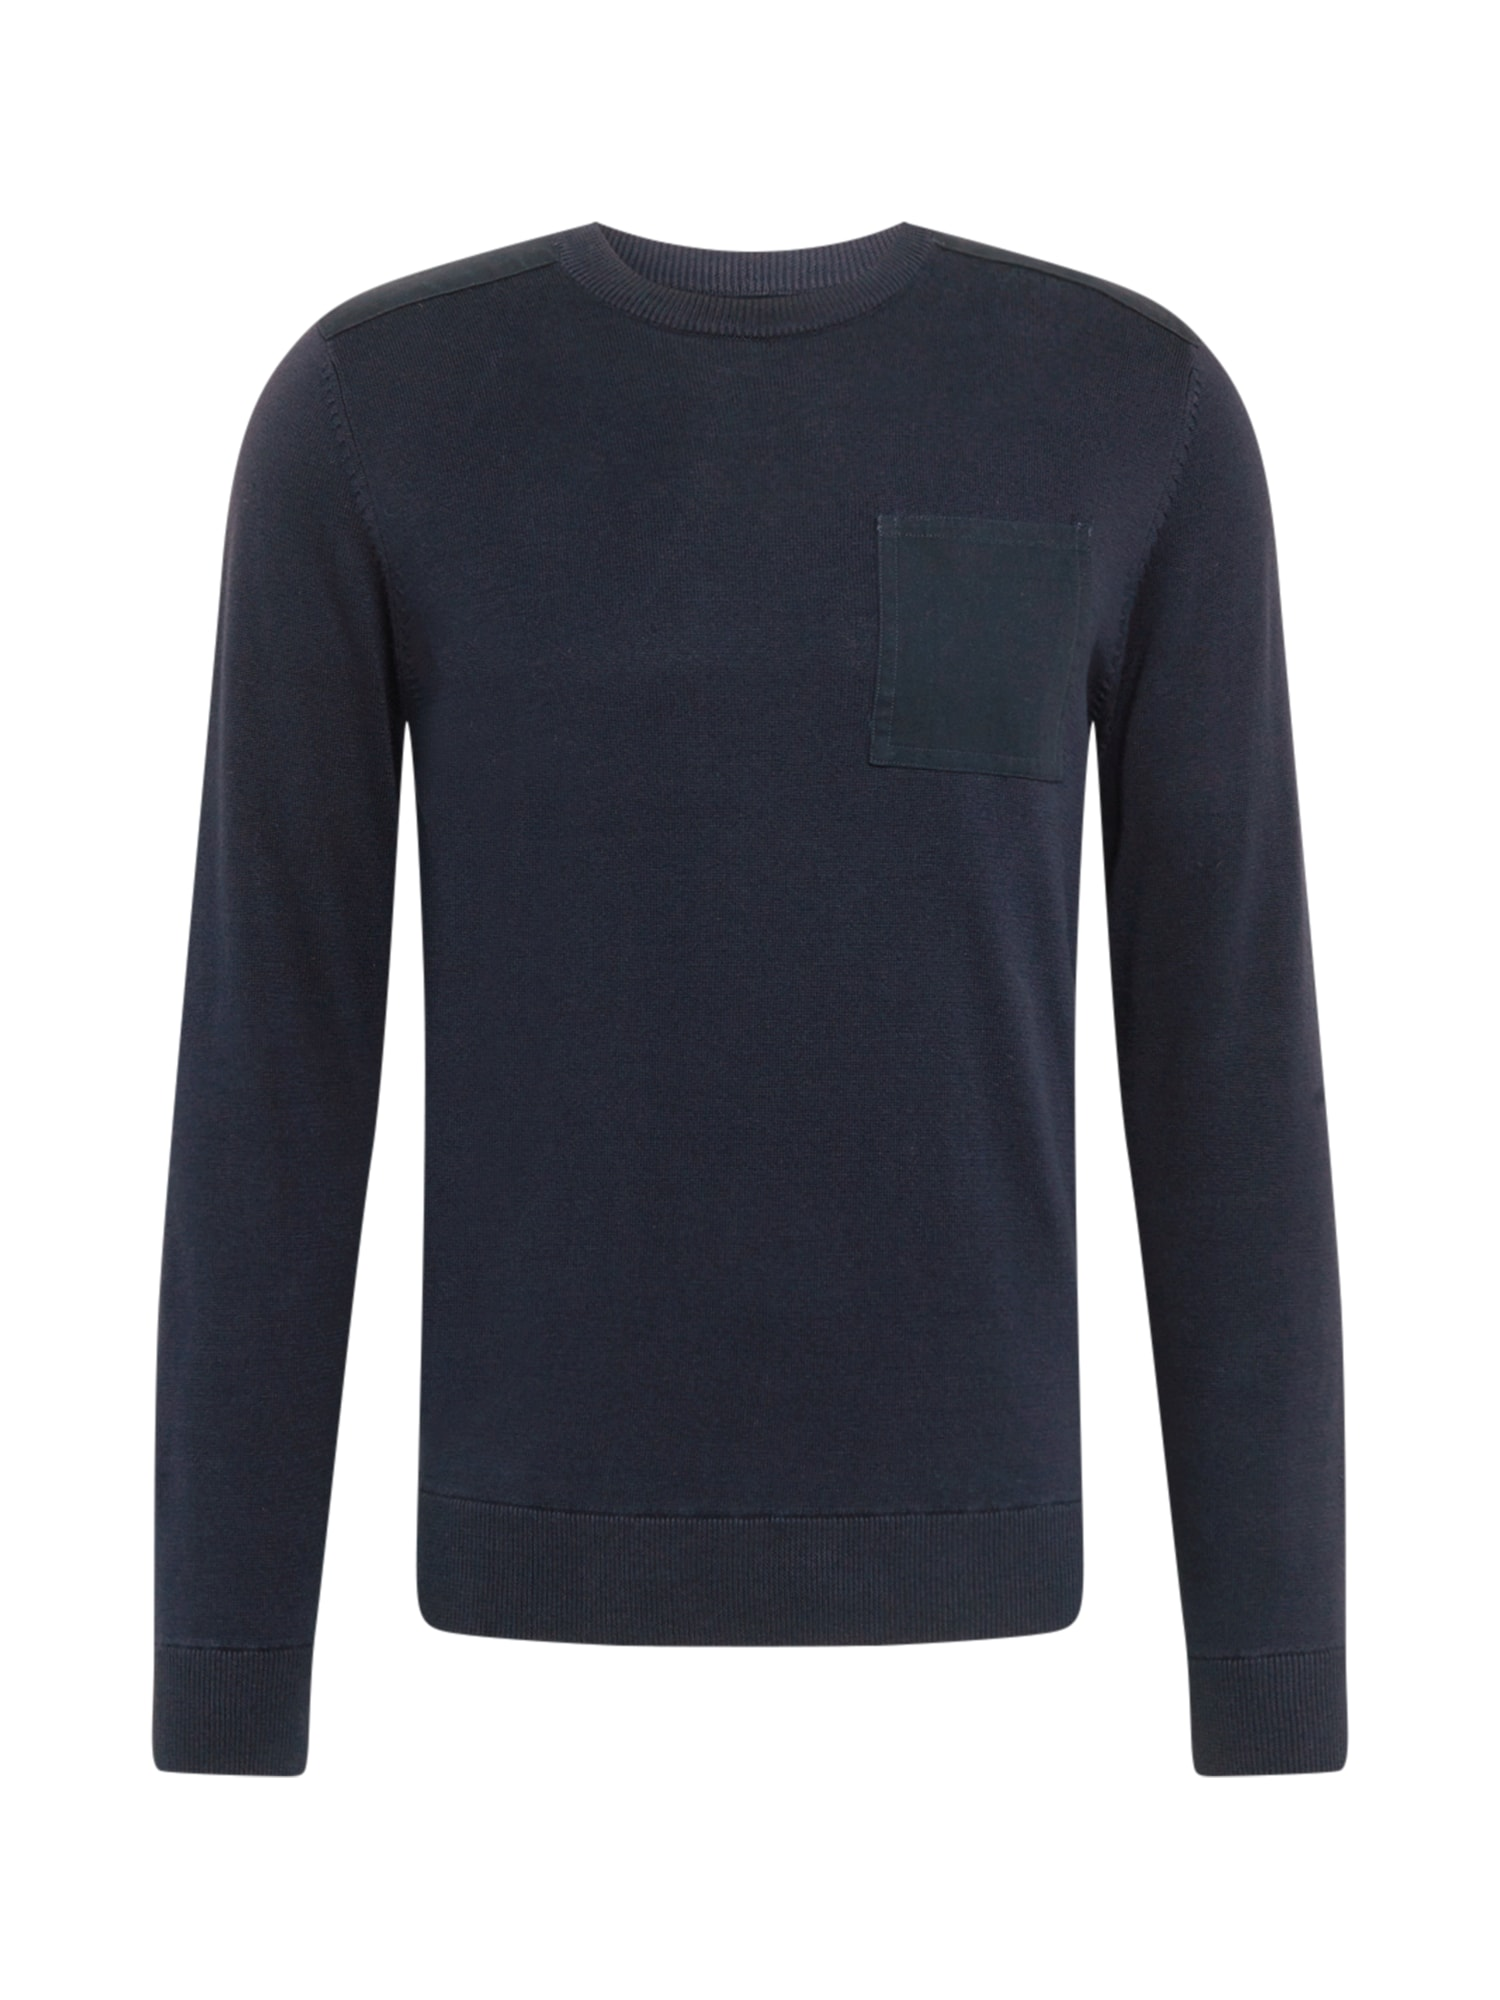 BURTON MENSWEAR LONDON Megztinis tamsiai mėlyna